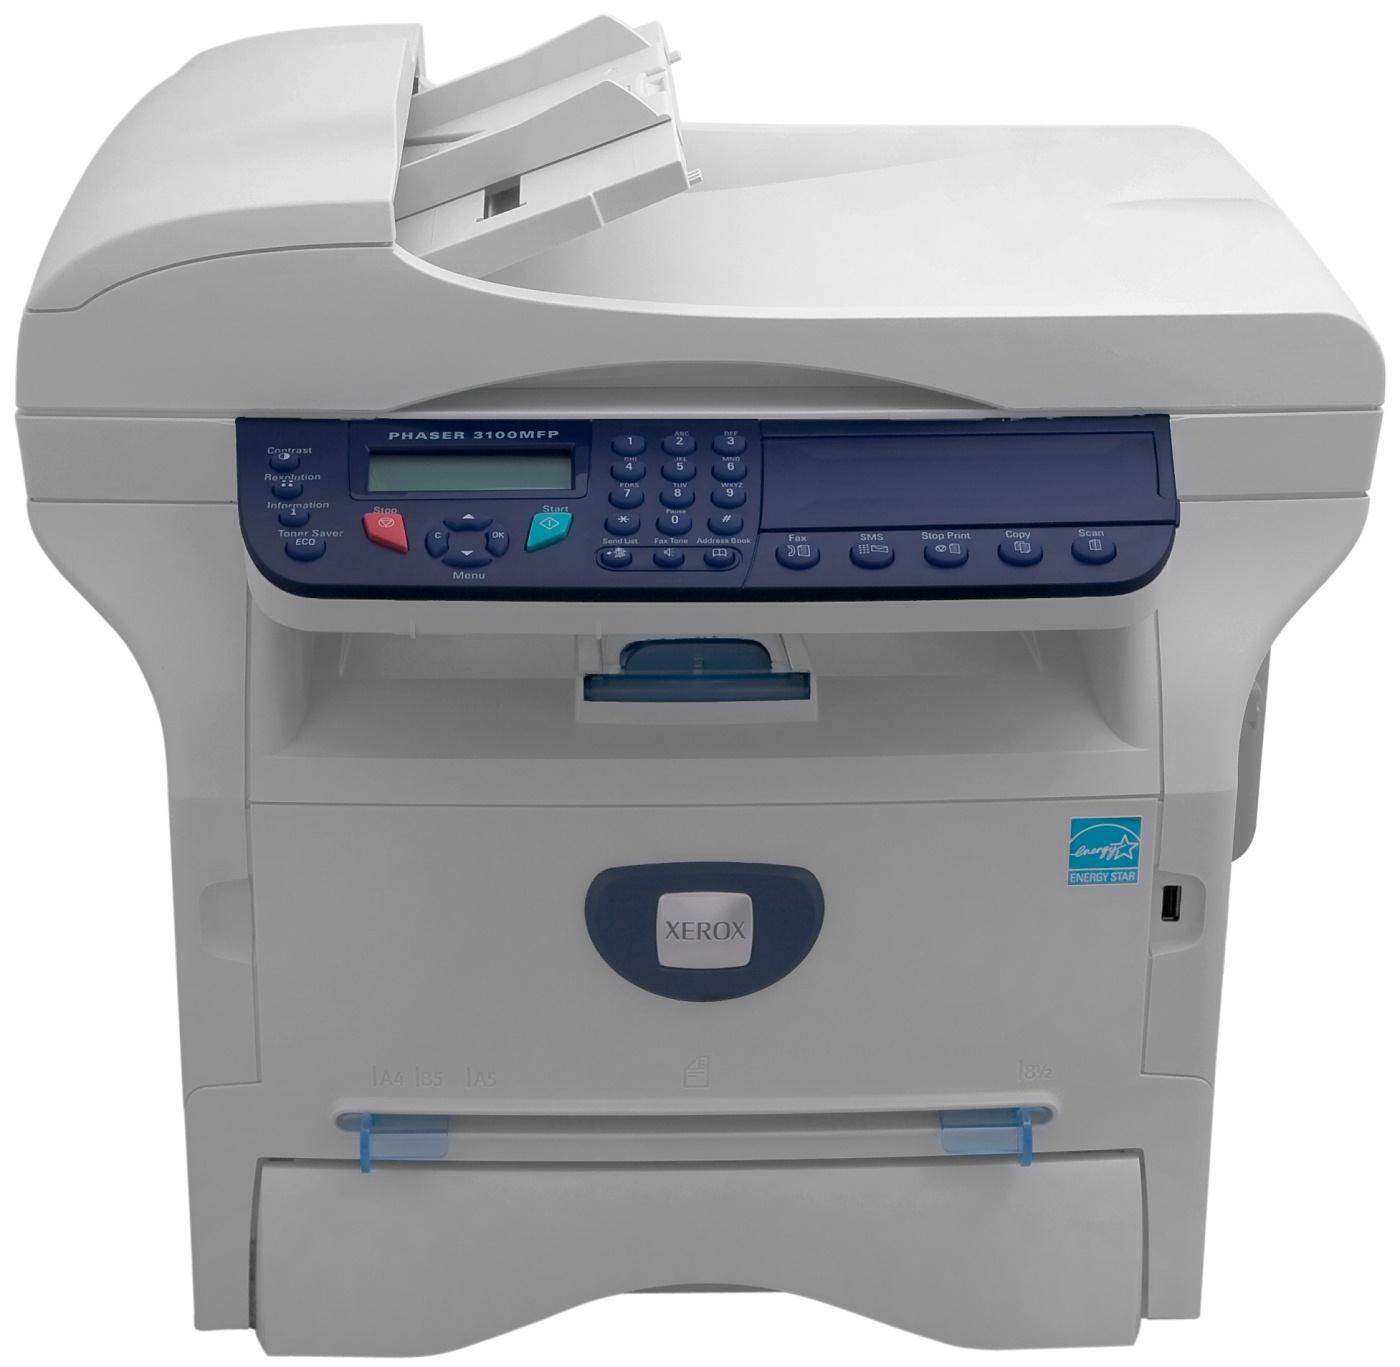 Xerox phaser 3100 mfp сканер драйвер скачать